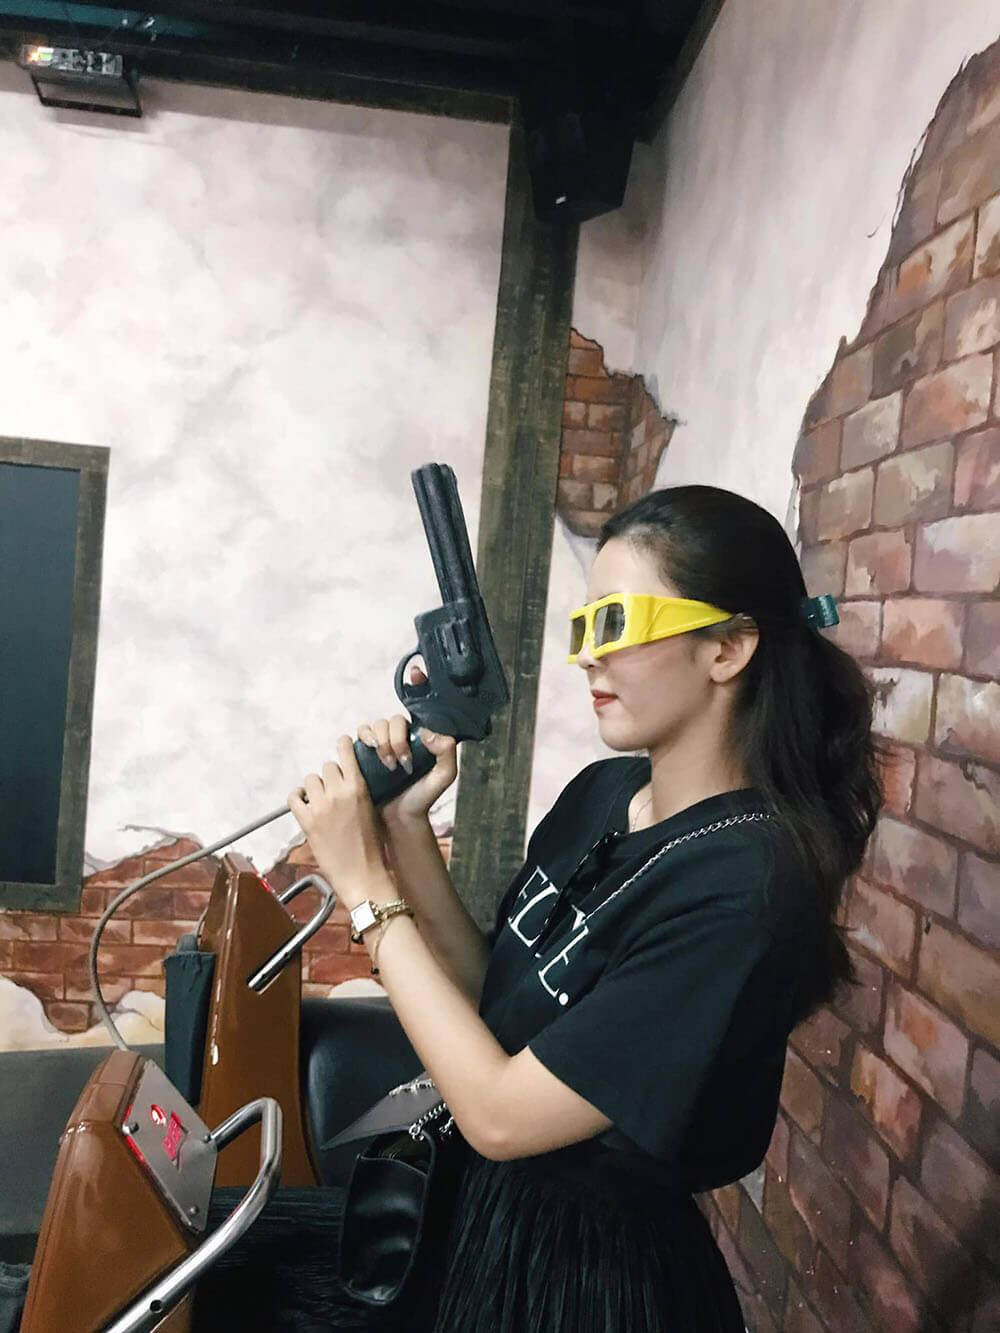 Cong Vien Fantasy Park Review Hue Da Nang Hoi An Ninh Binh 7n7d Chi Voi 8 Trieu Tin Duoc Khong 01